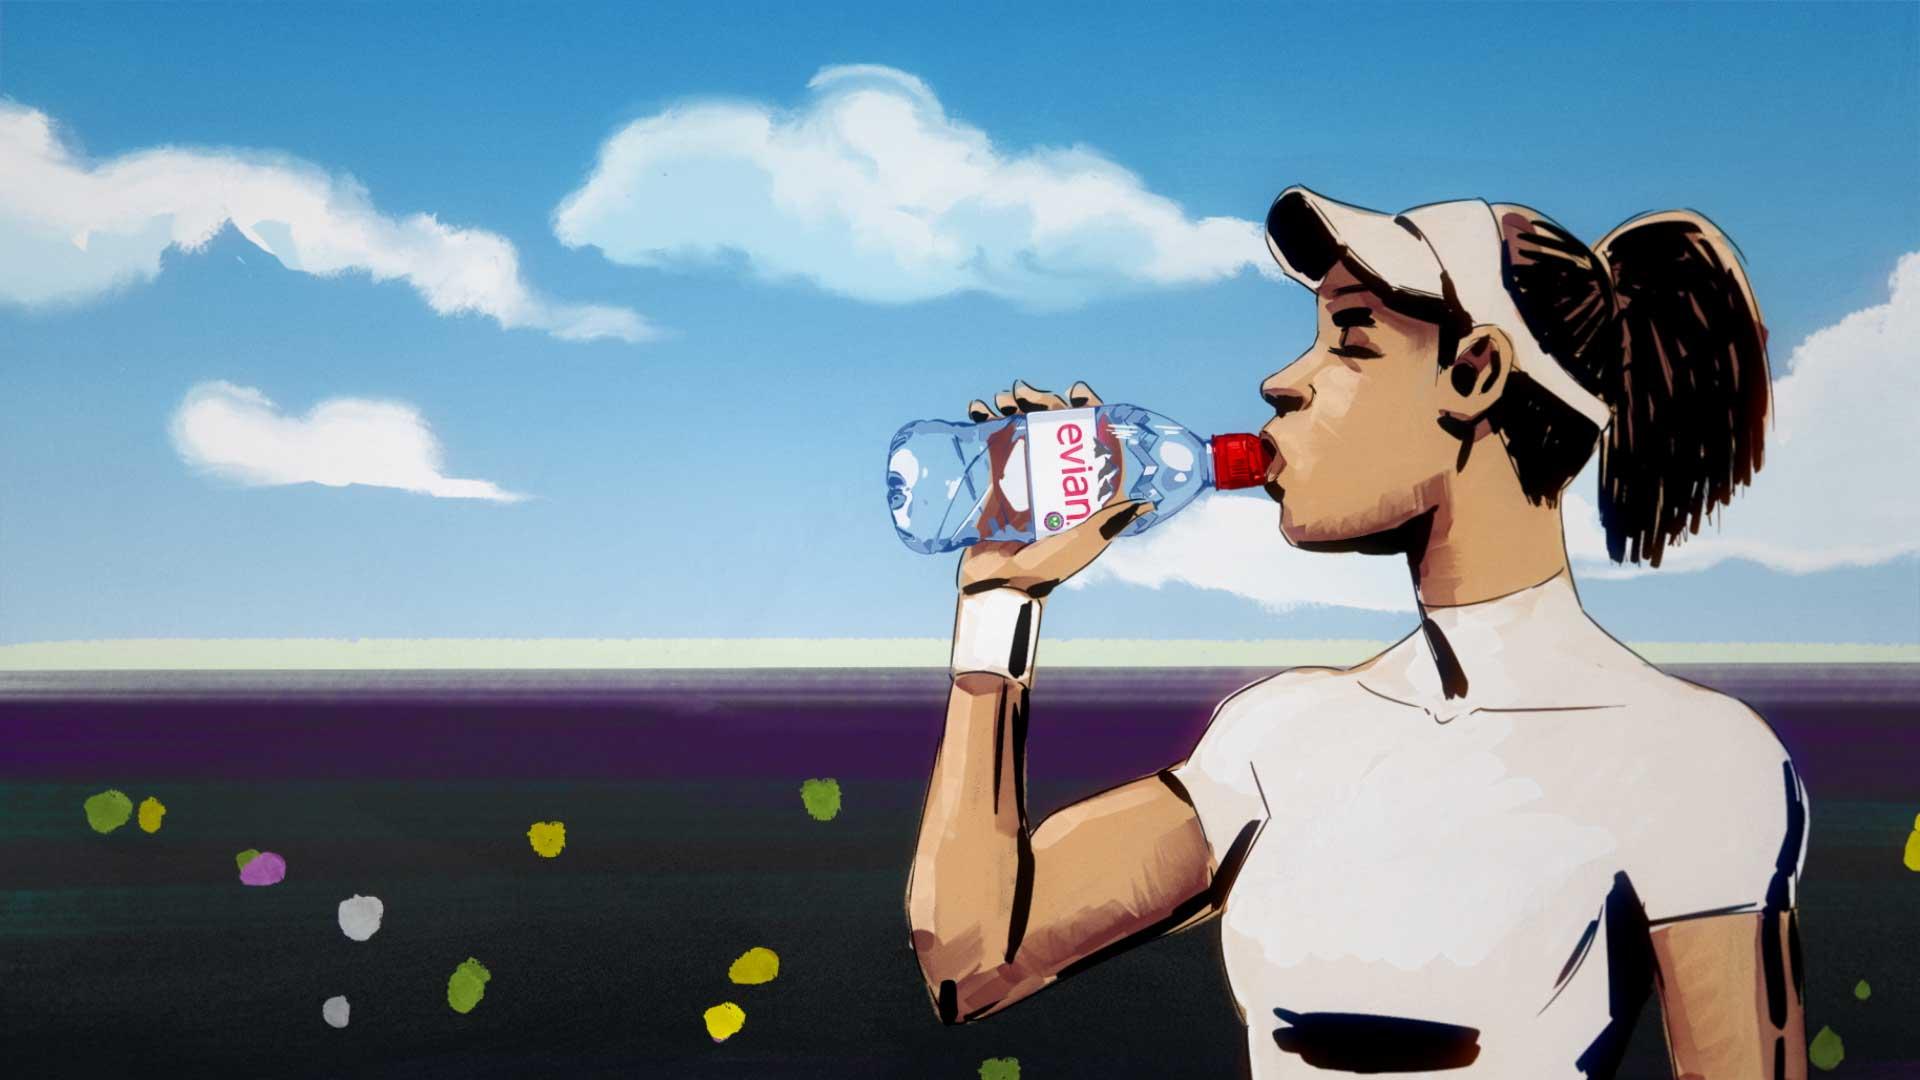 Wimbledon2019_EVAN_30s_25fps_v4h.jpg